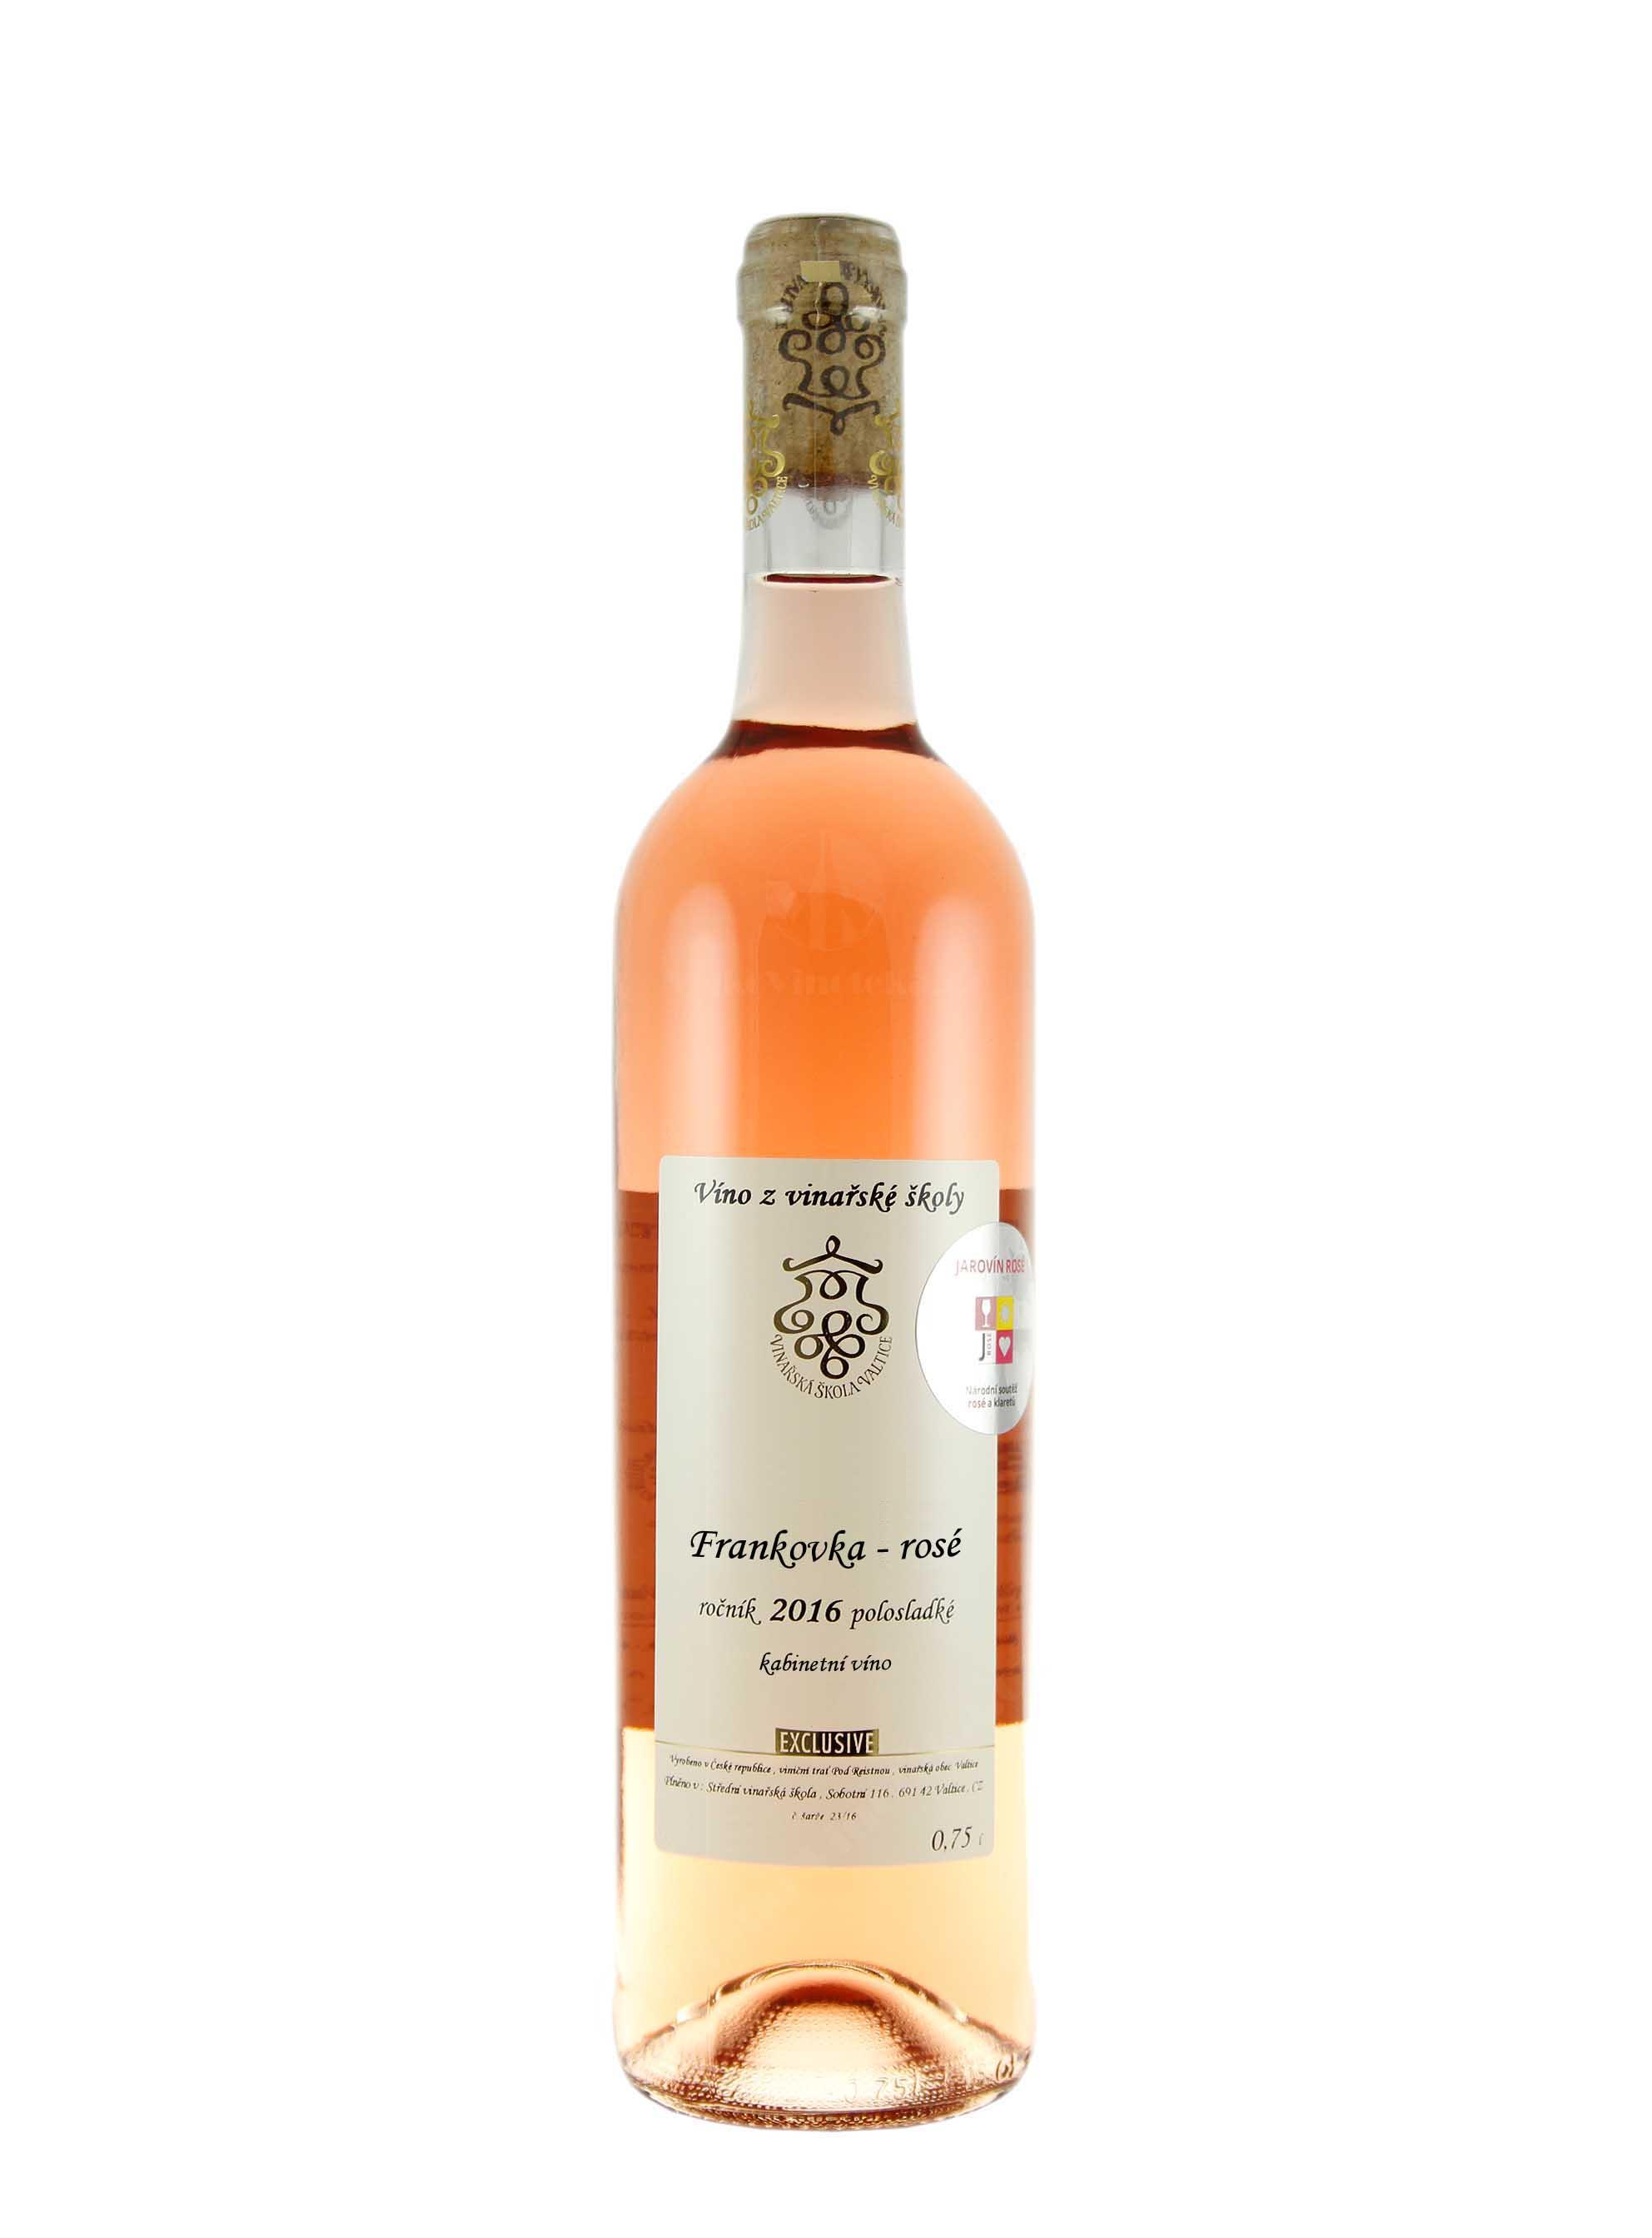 Frankovka rosé, Exclusive, Kabinet, 2016, Vinařská škola Valtice, 0.75 l